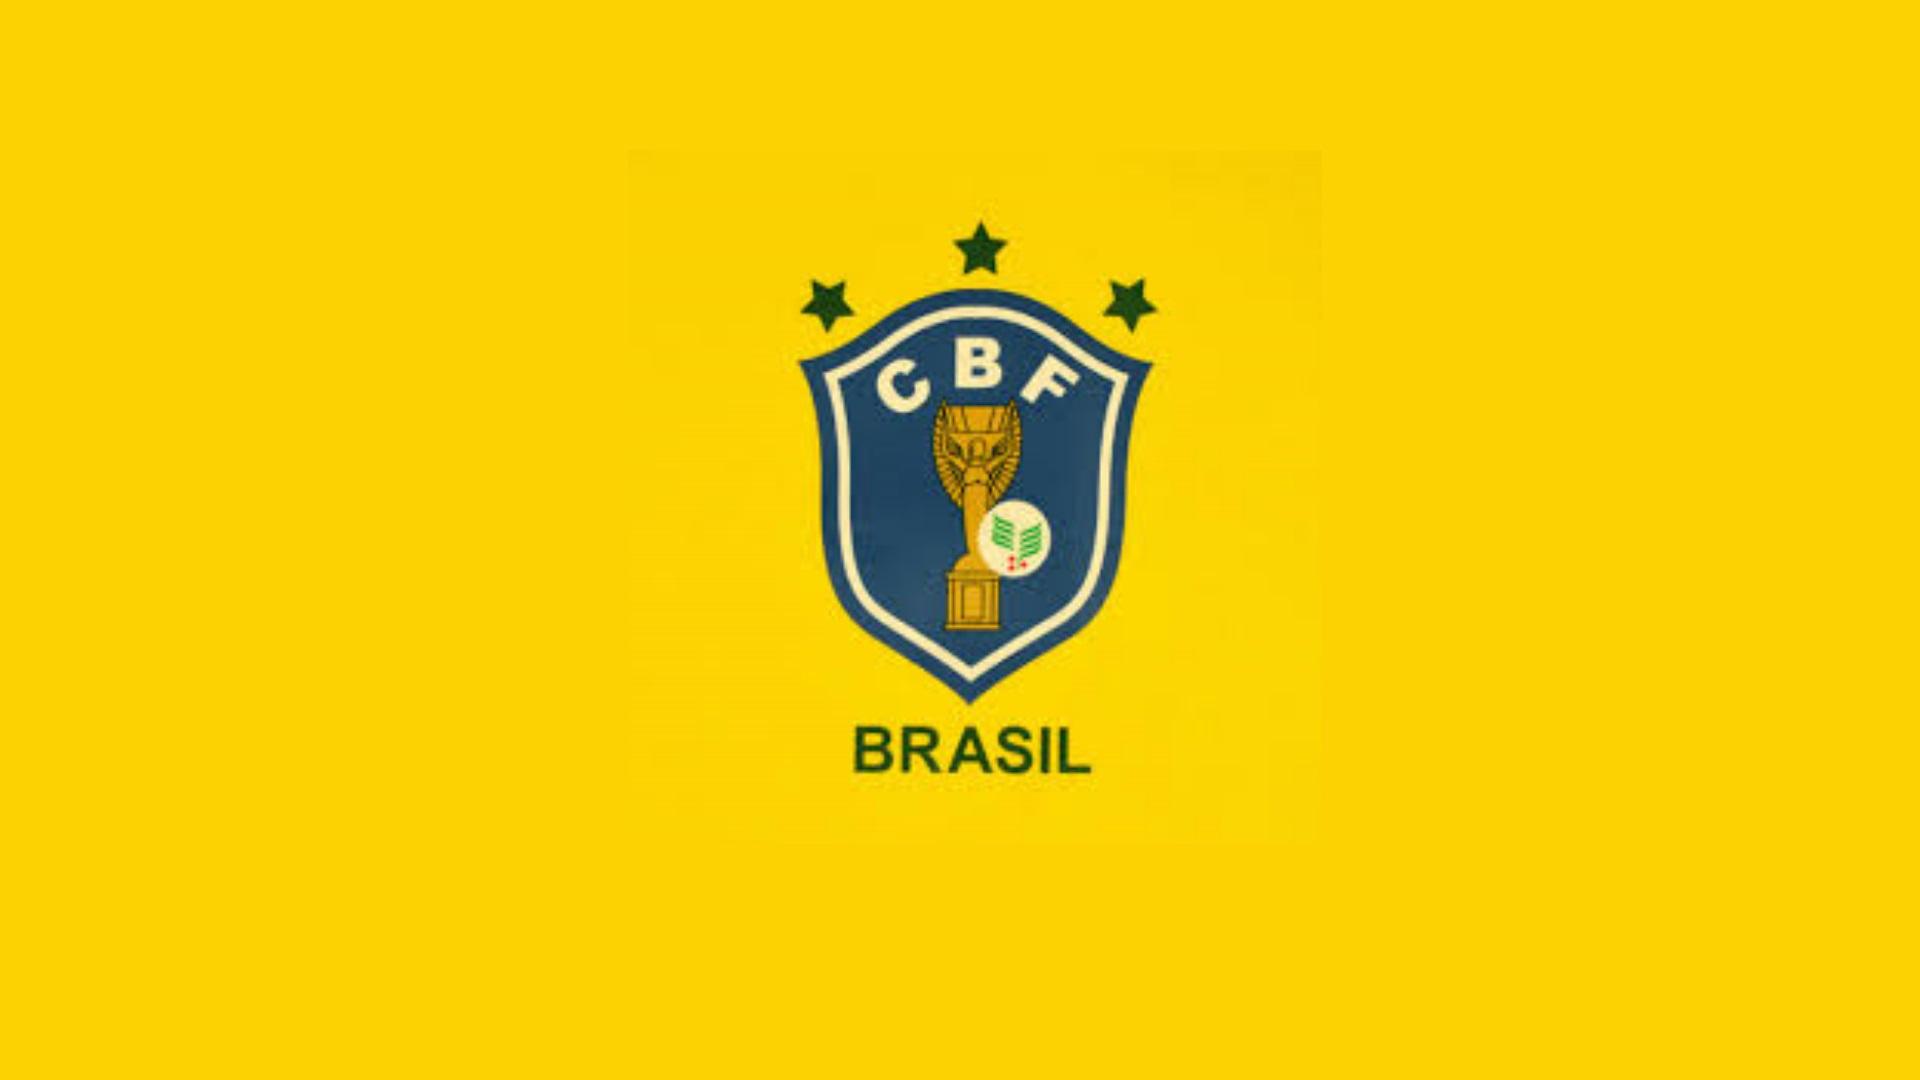 Escudo CBF Brasil Copa 1982 08 11 2017